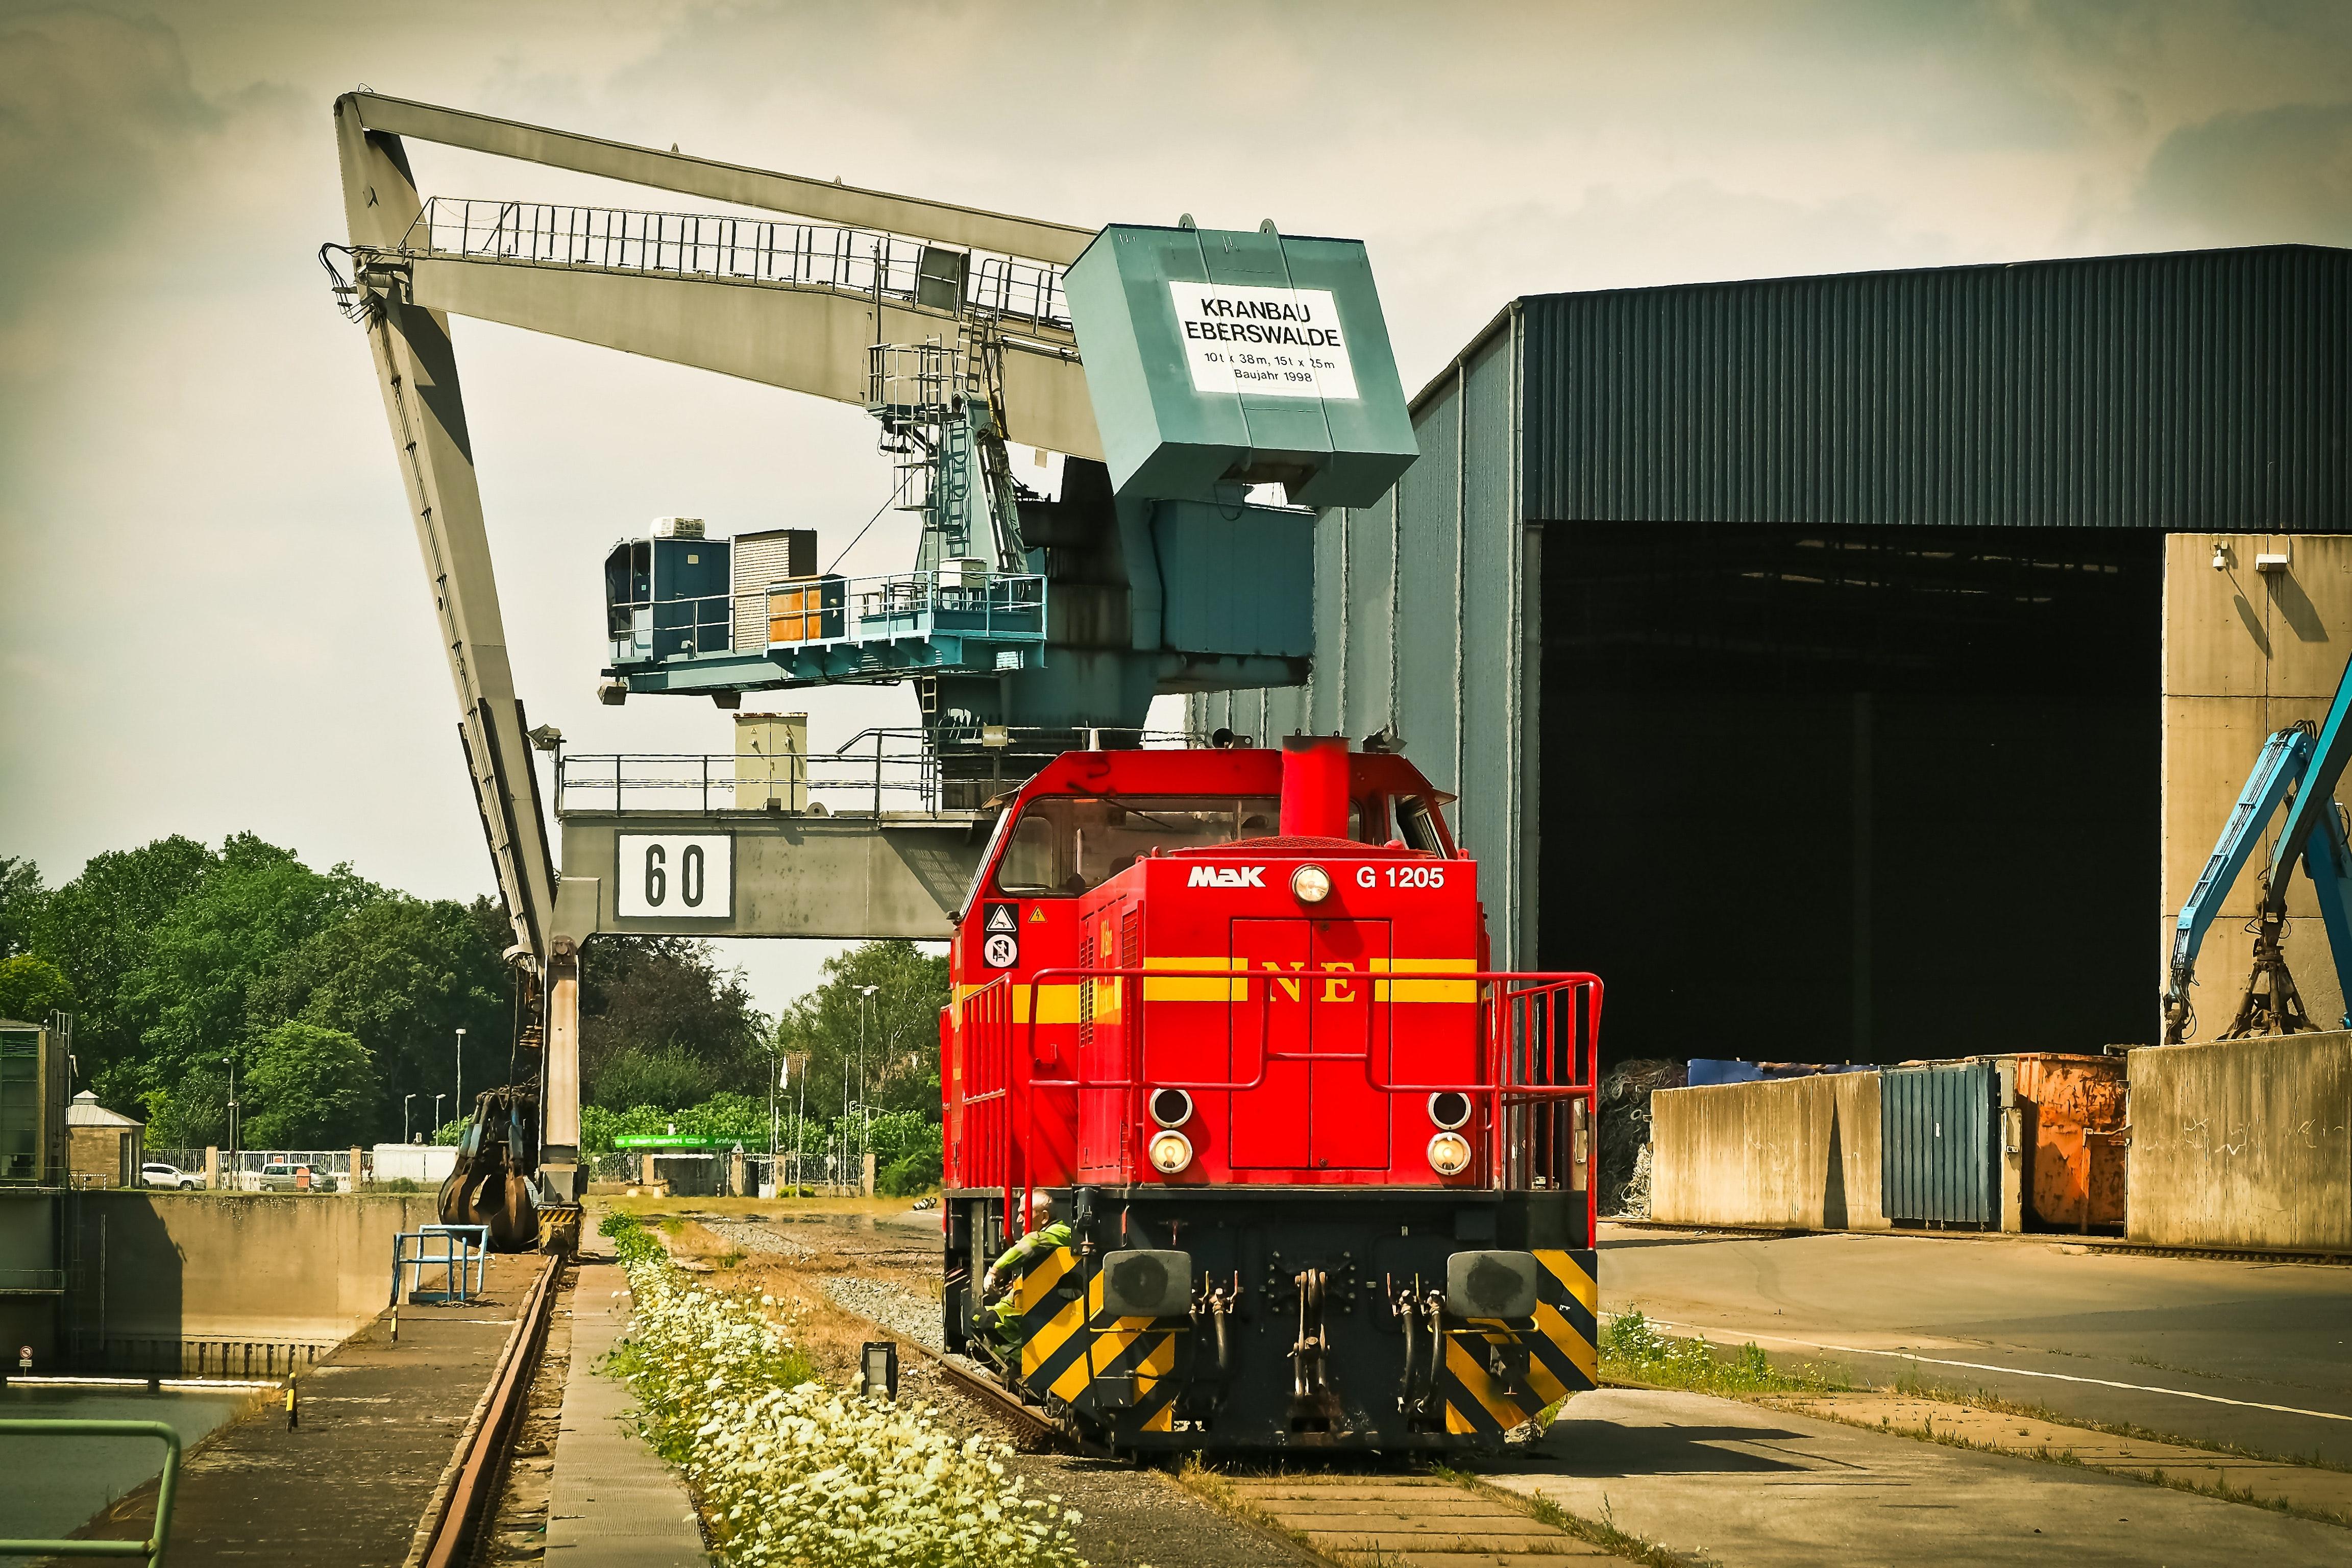 Red Mak Train on Brown Train Tracks, Building, Railway, Truck, Trees, HQ Photo